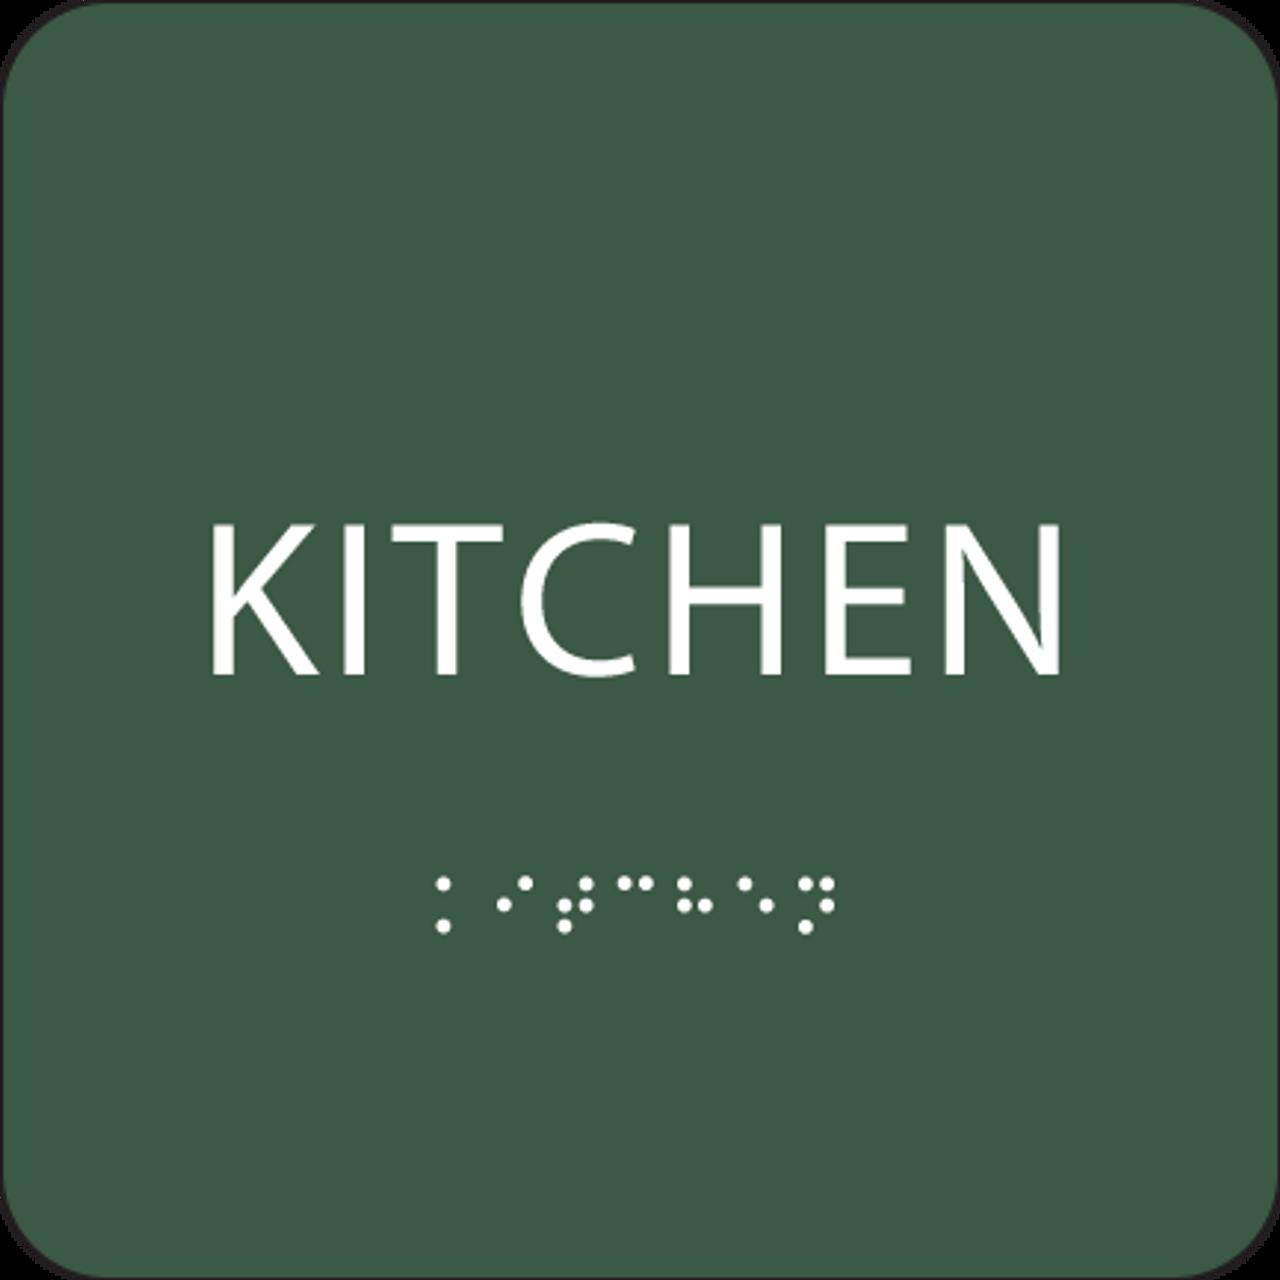 Green ADA Kitchen Sign